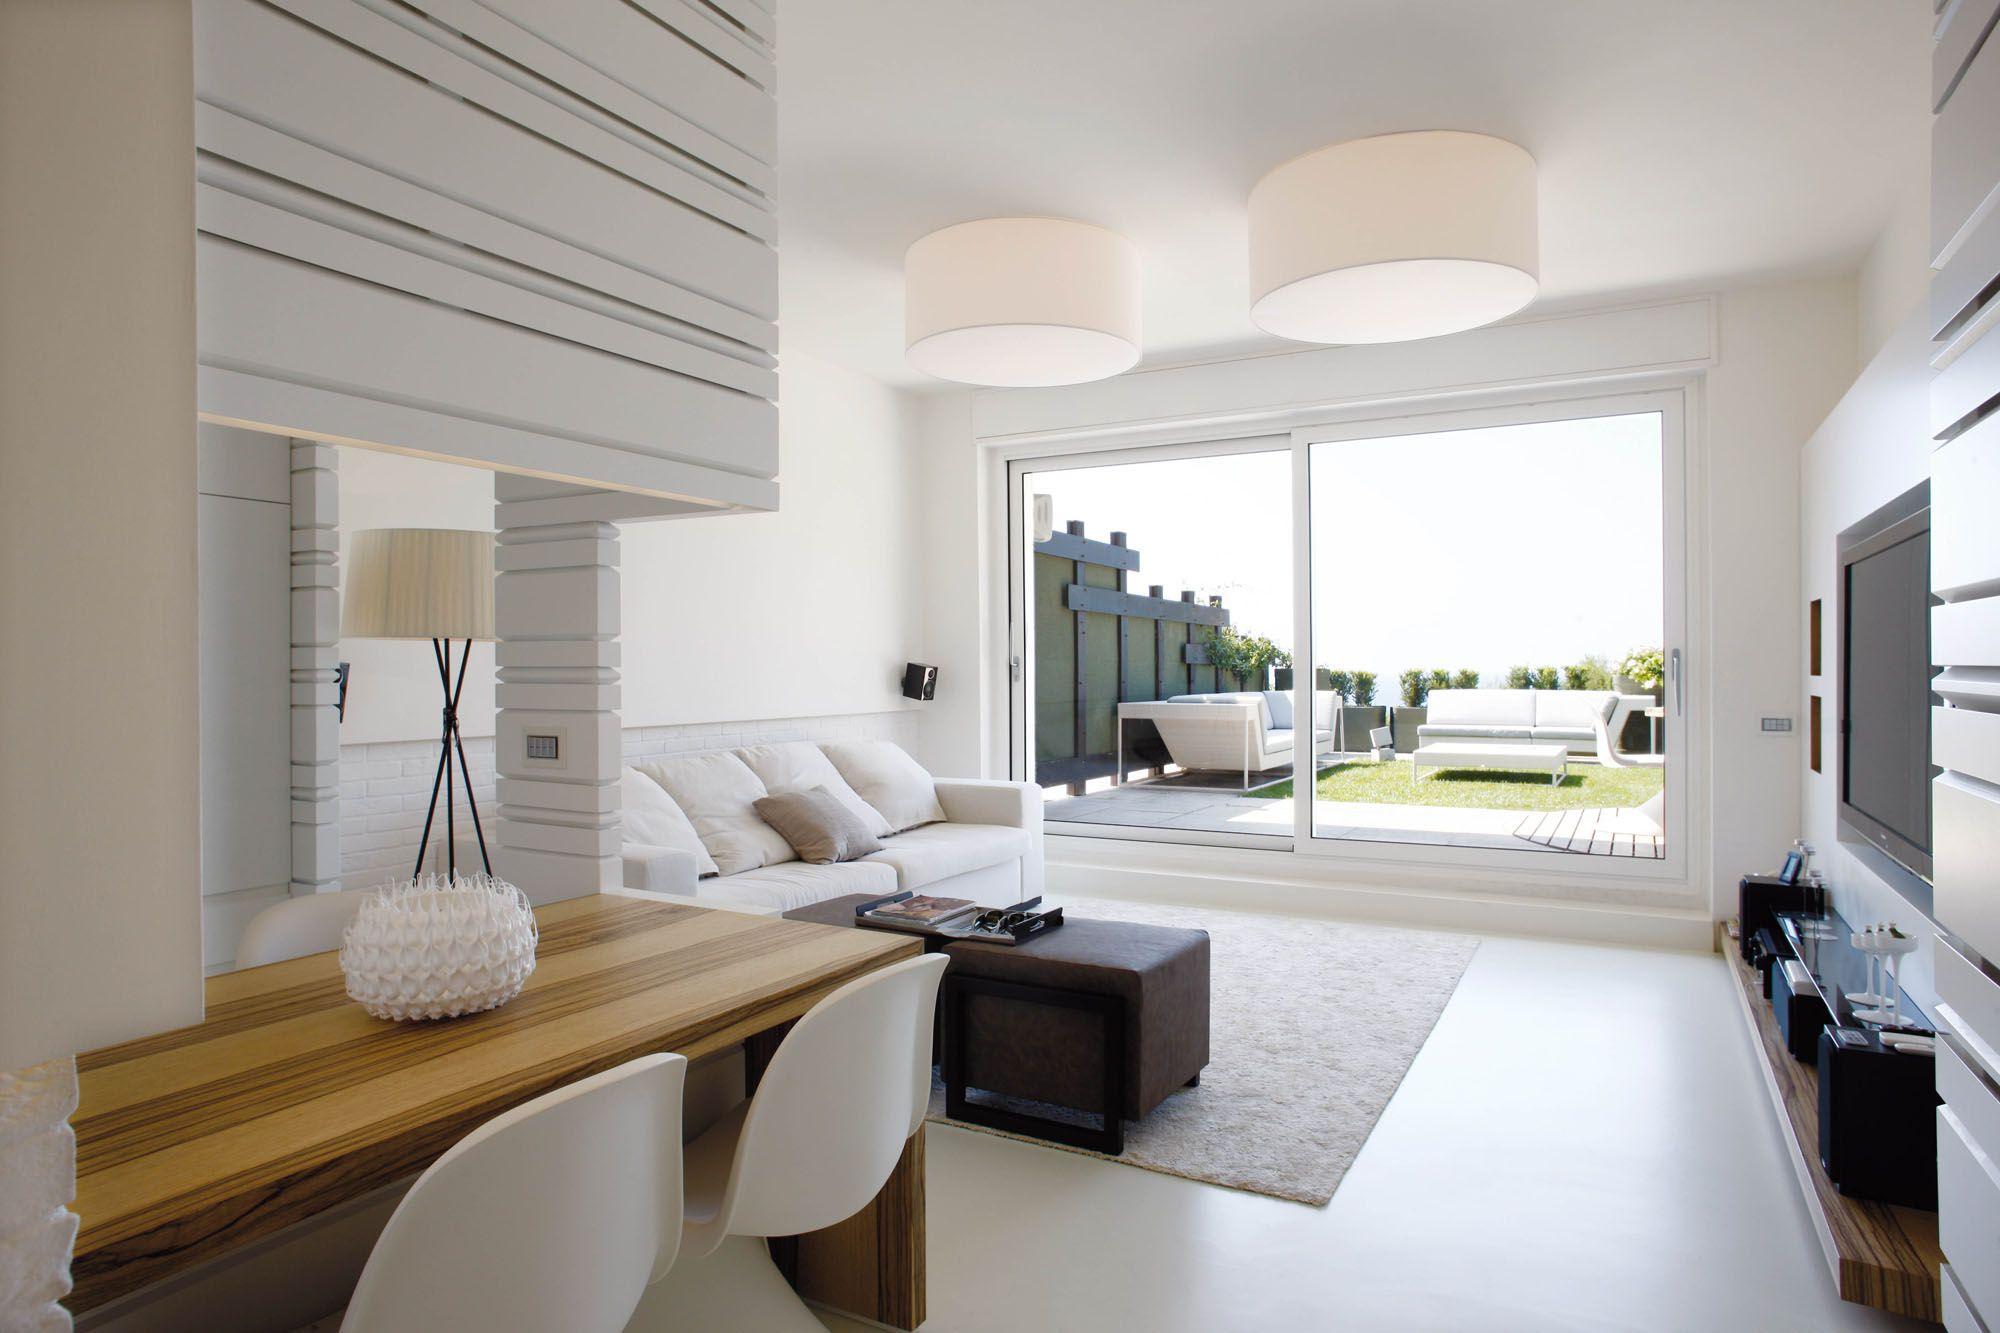 Contemporary casa pina by fabio fantolino caandesign for Arredamento attico